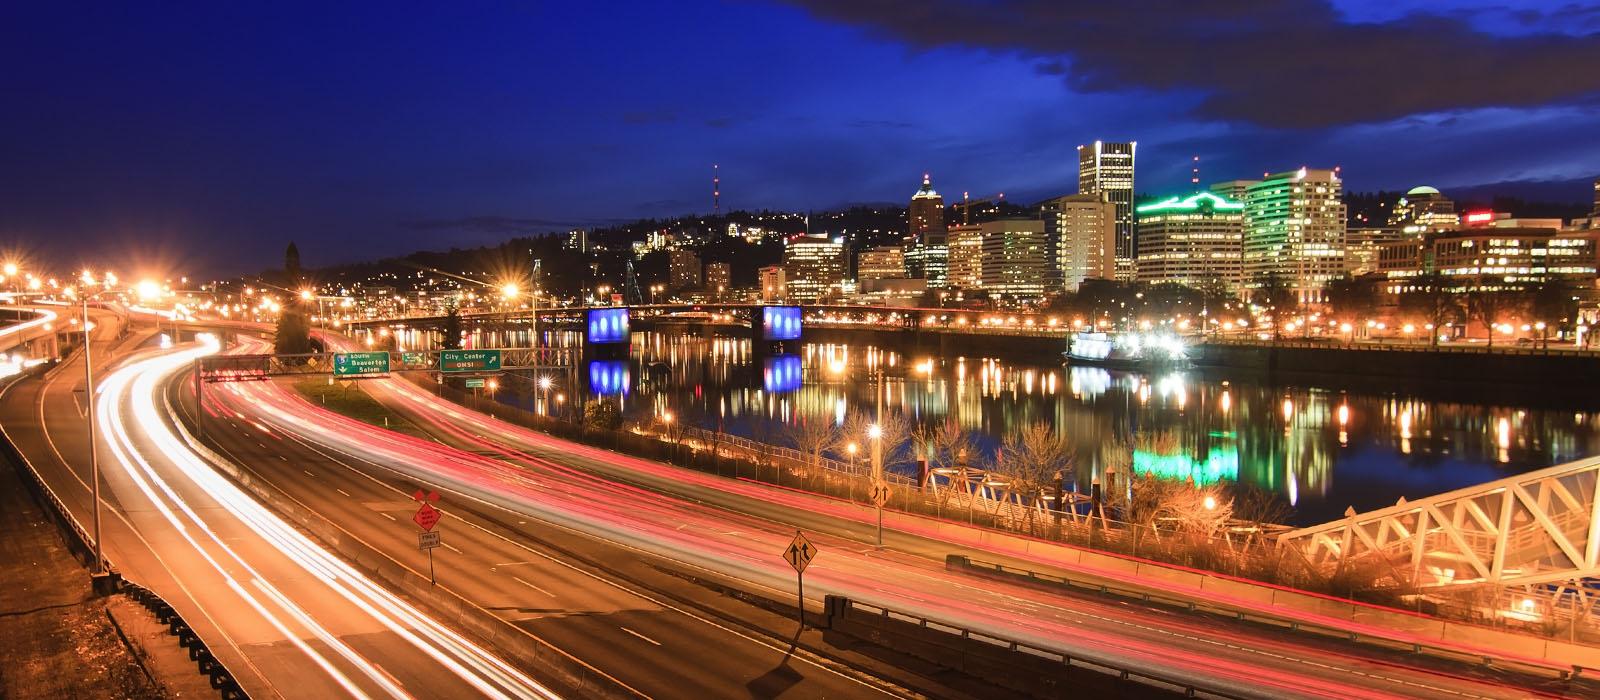 portland-relocation_0001_bigstock-Landscape-Of-Portland-Oregon-146042661